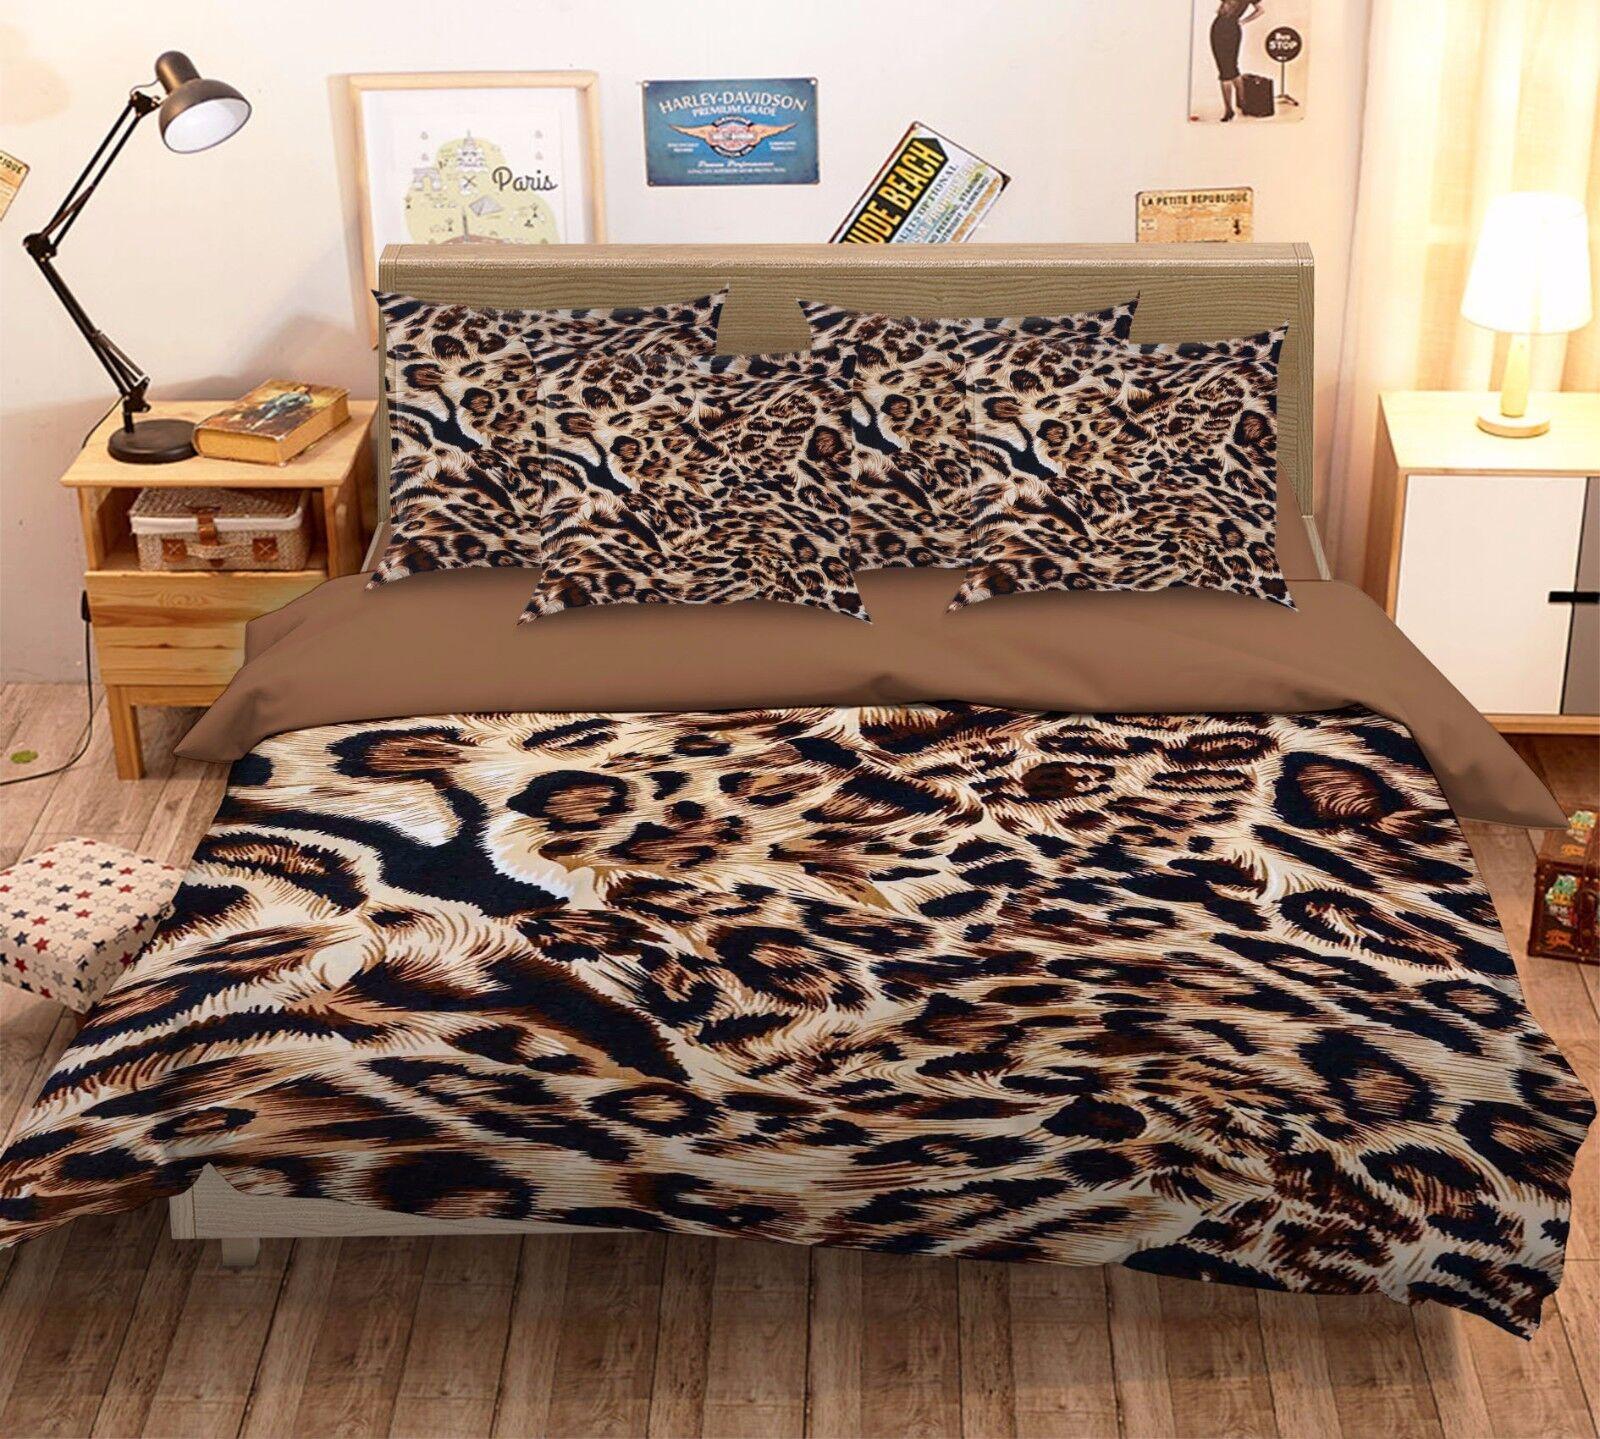 3D Fashion Leopard Skin 42 Bed Pillowcases Quilt Duvet Cover Set Single Queen CA